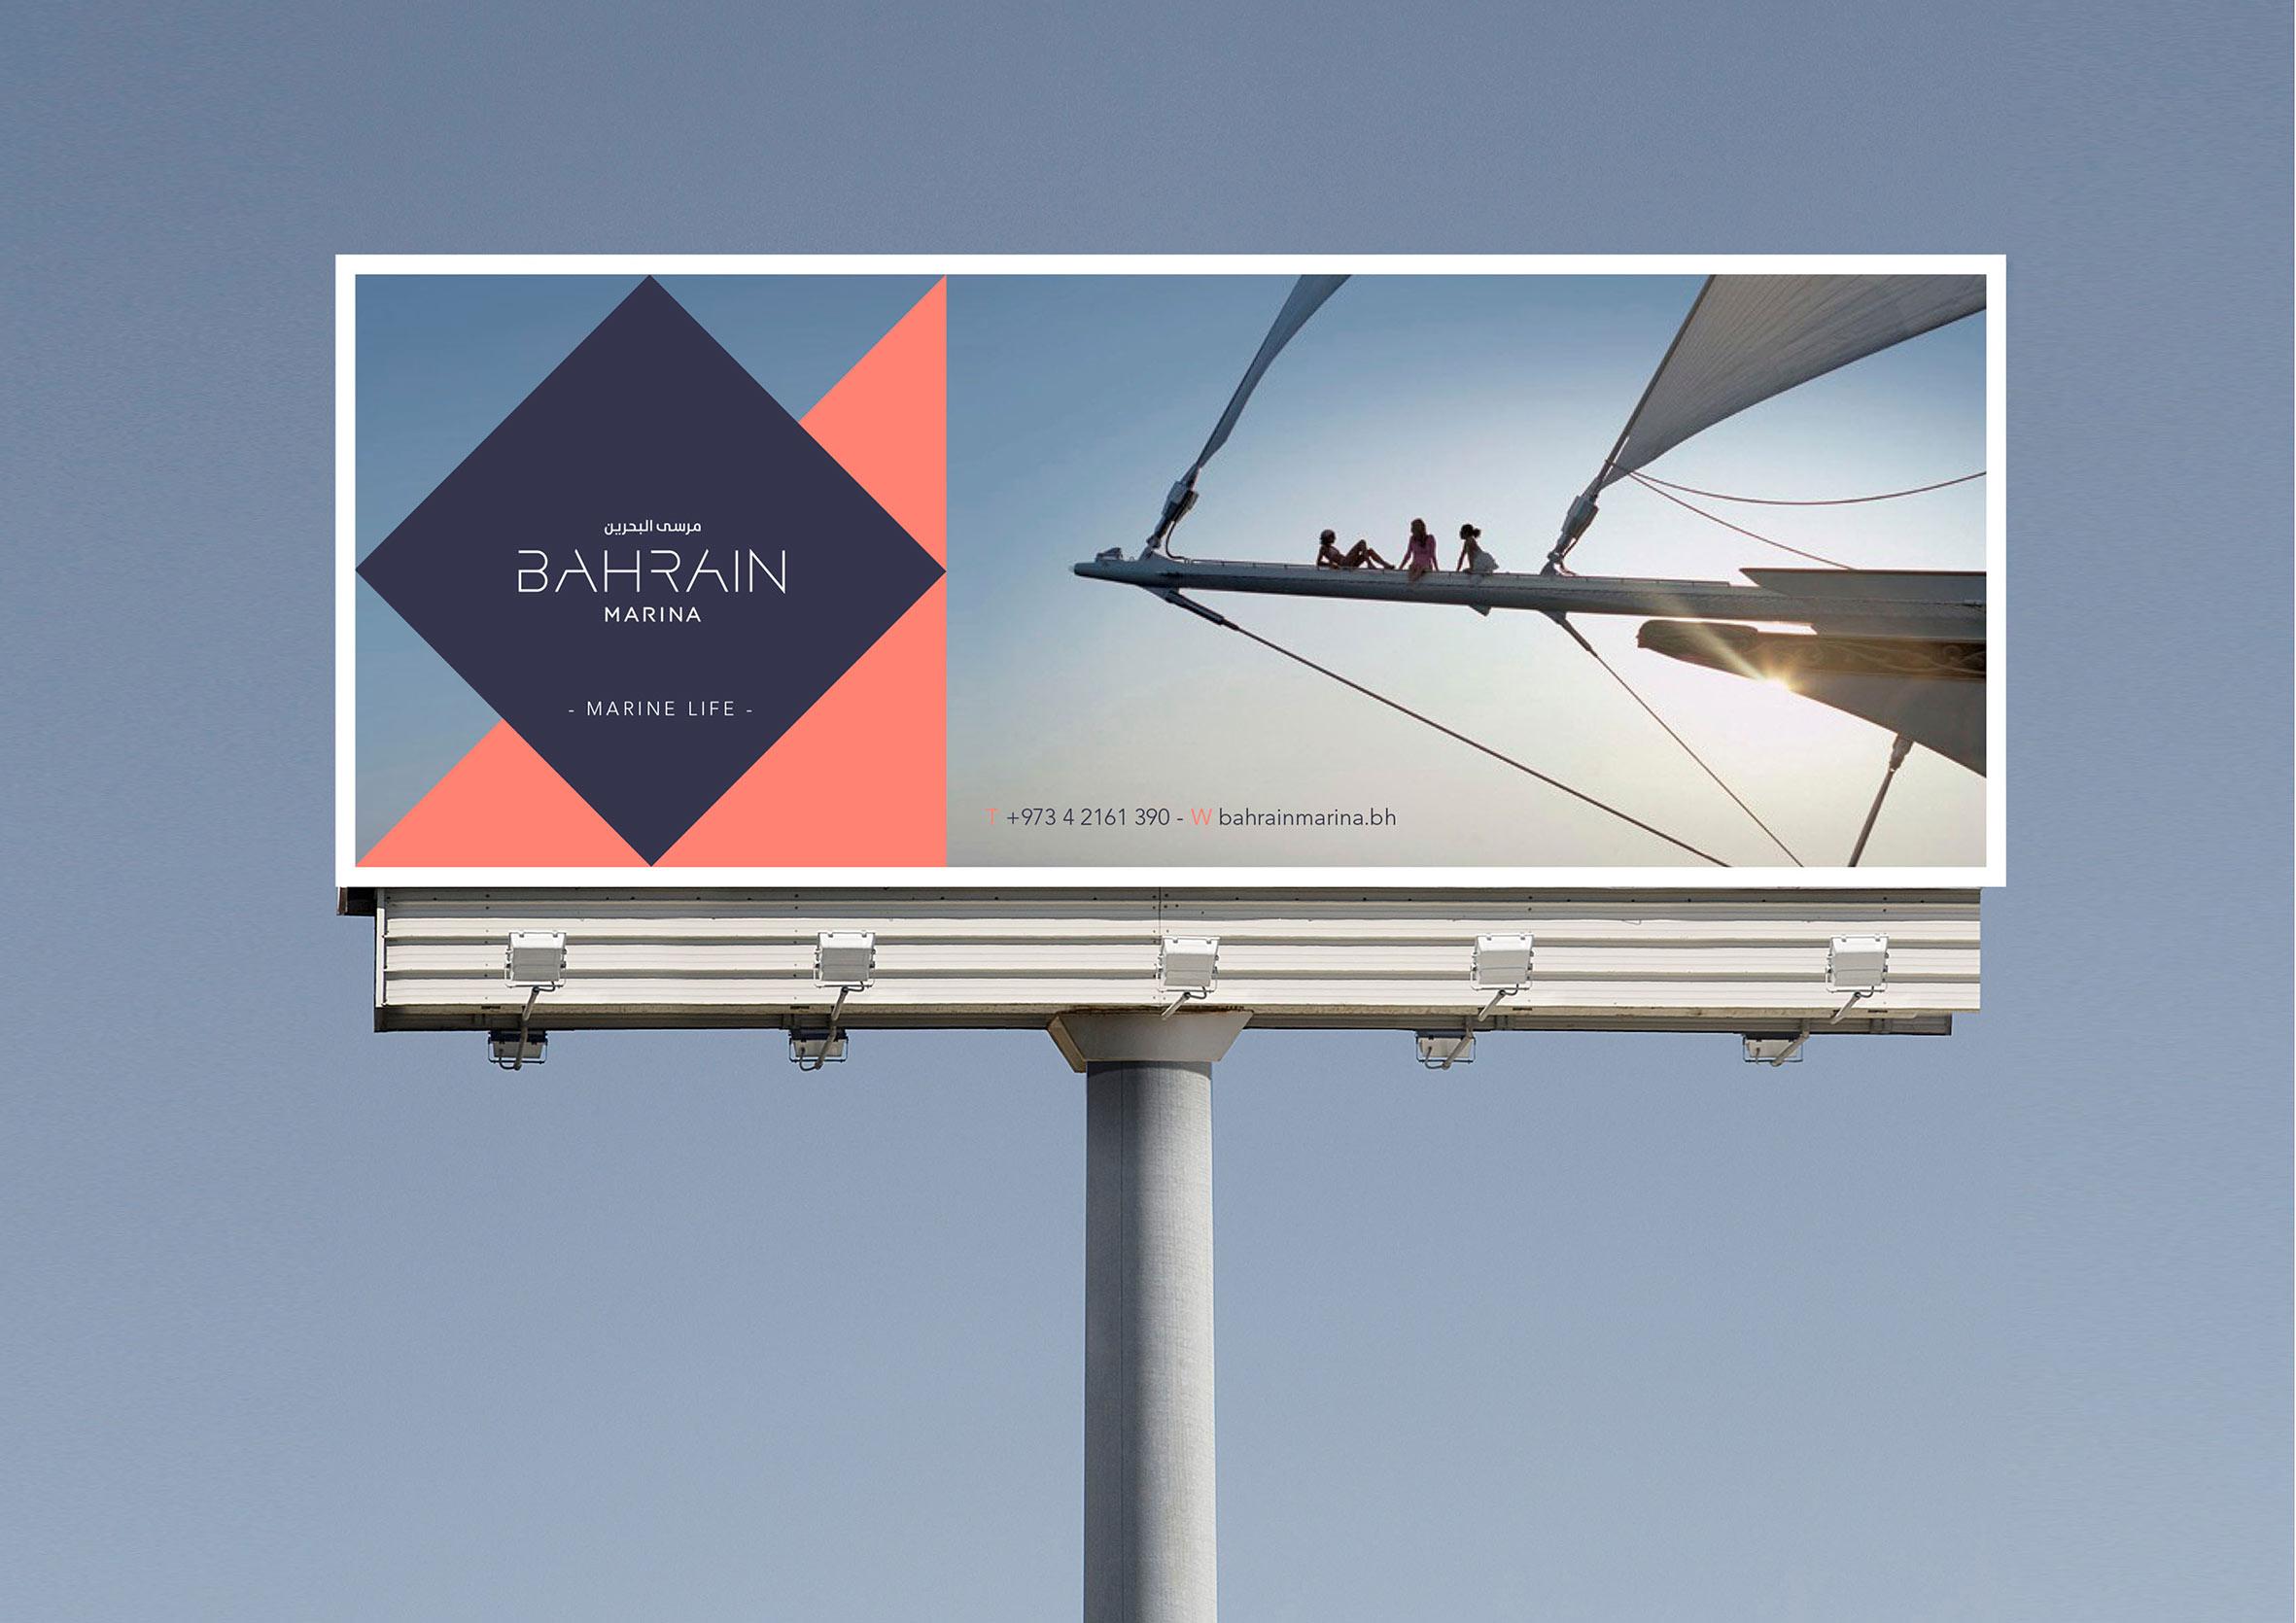 Bahrain-marina-identite-branding-publicite-billboard.jpg